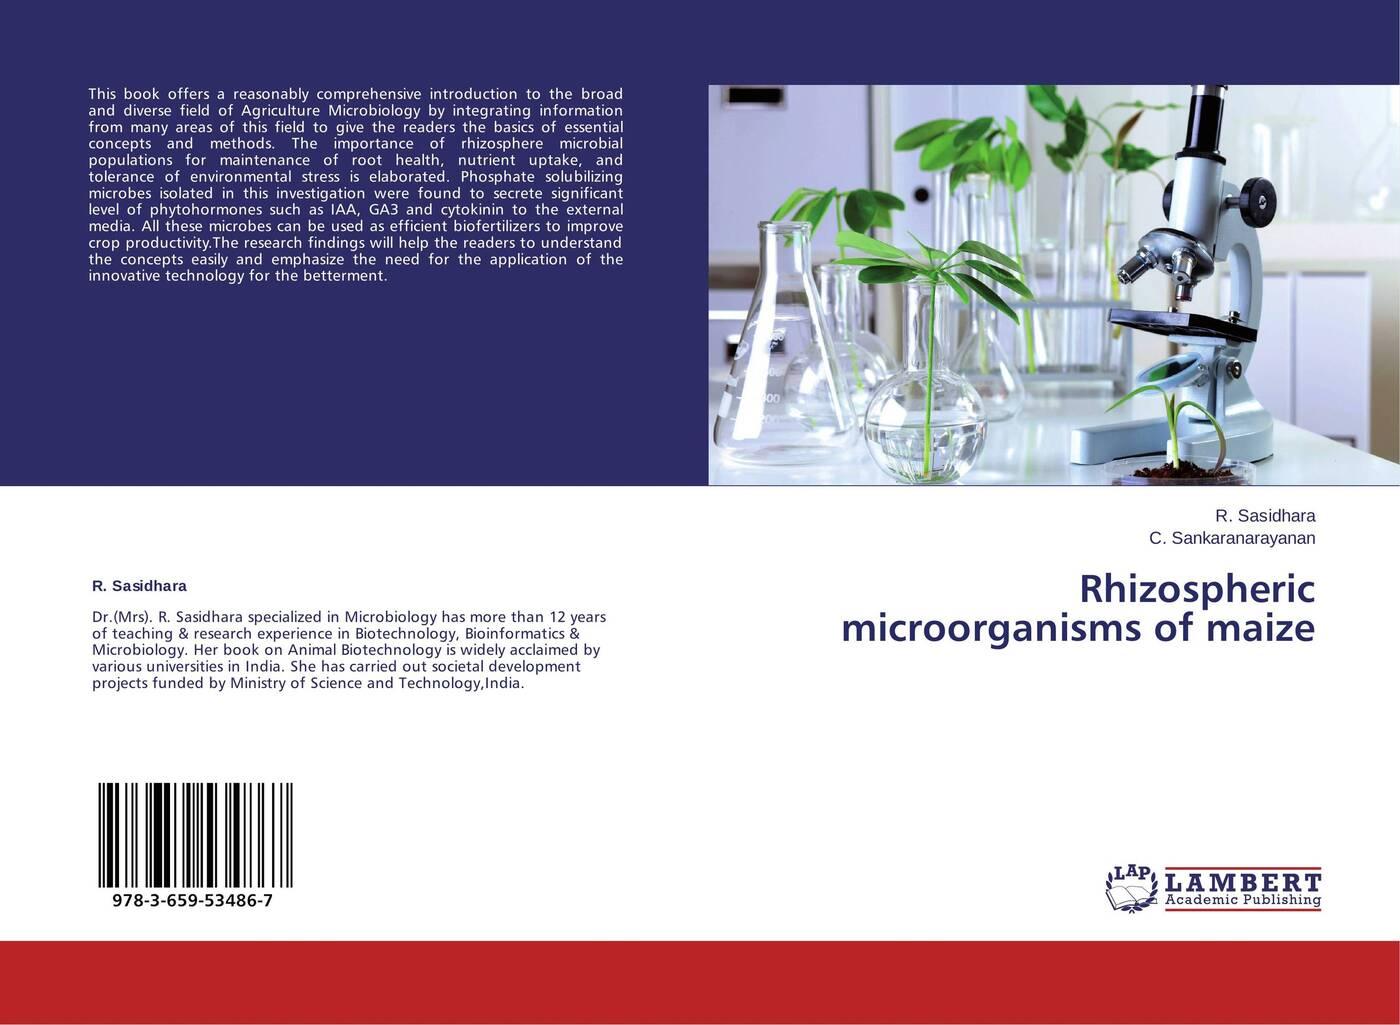 R. Sasidhara and C. Sankaranarayanan Rhizospheric microorganisms of maize цена и фото